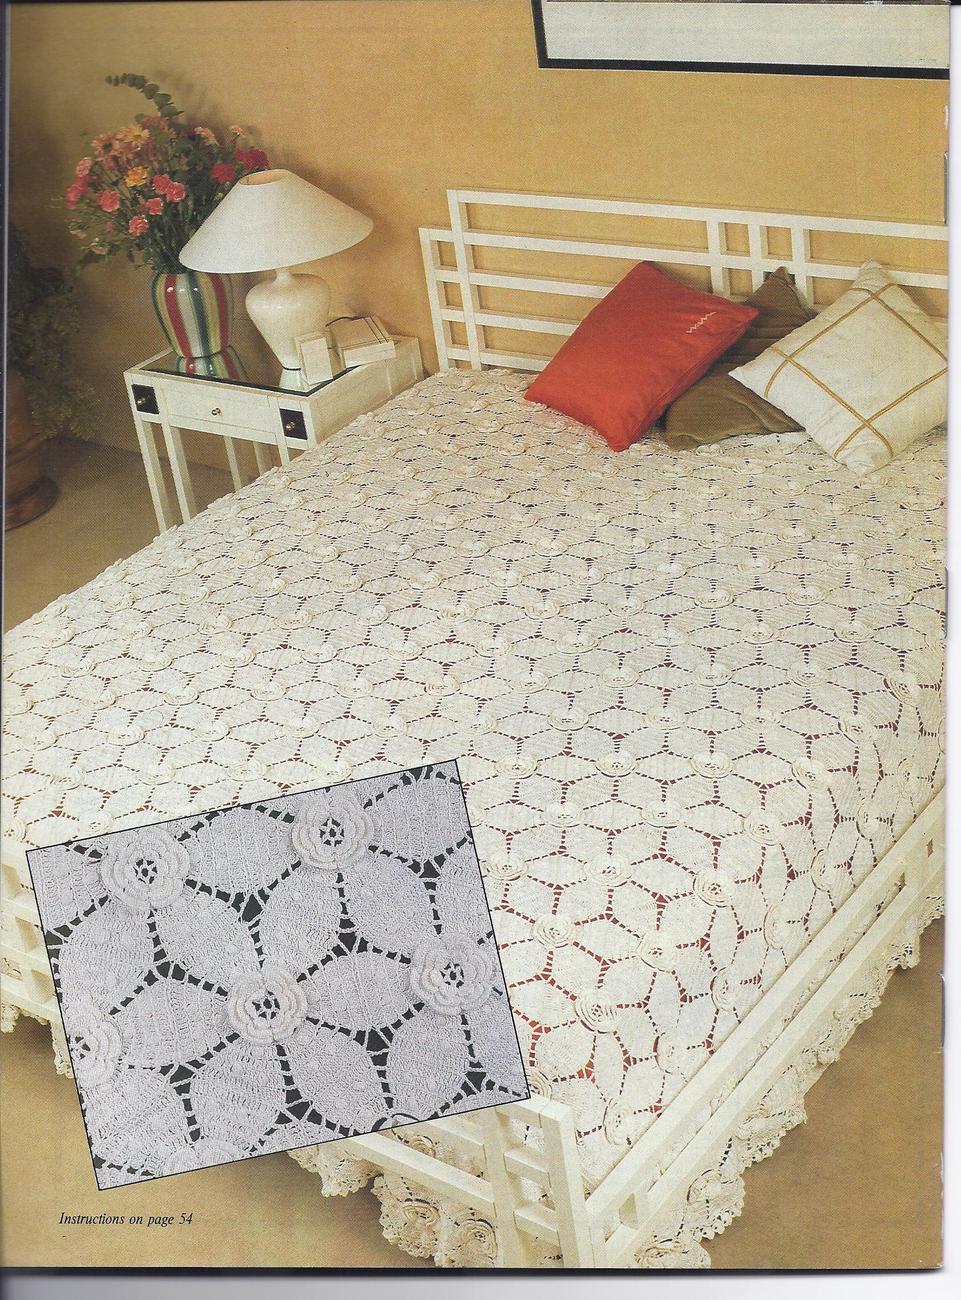 Decorative Crochet Pattern Magazine #17~~32 Patterns